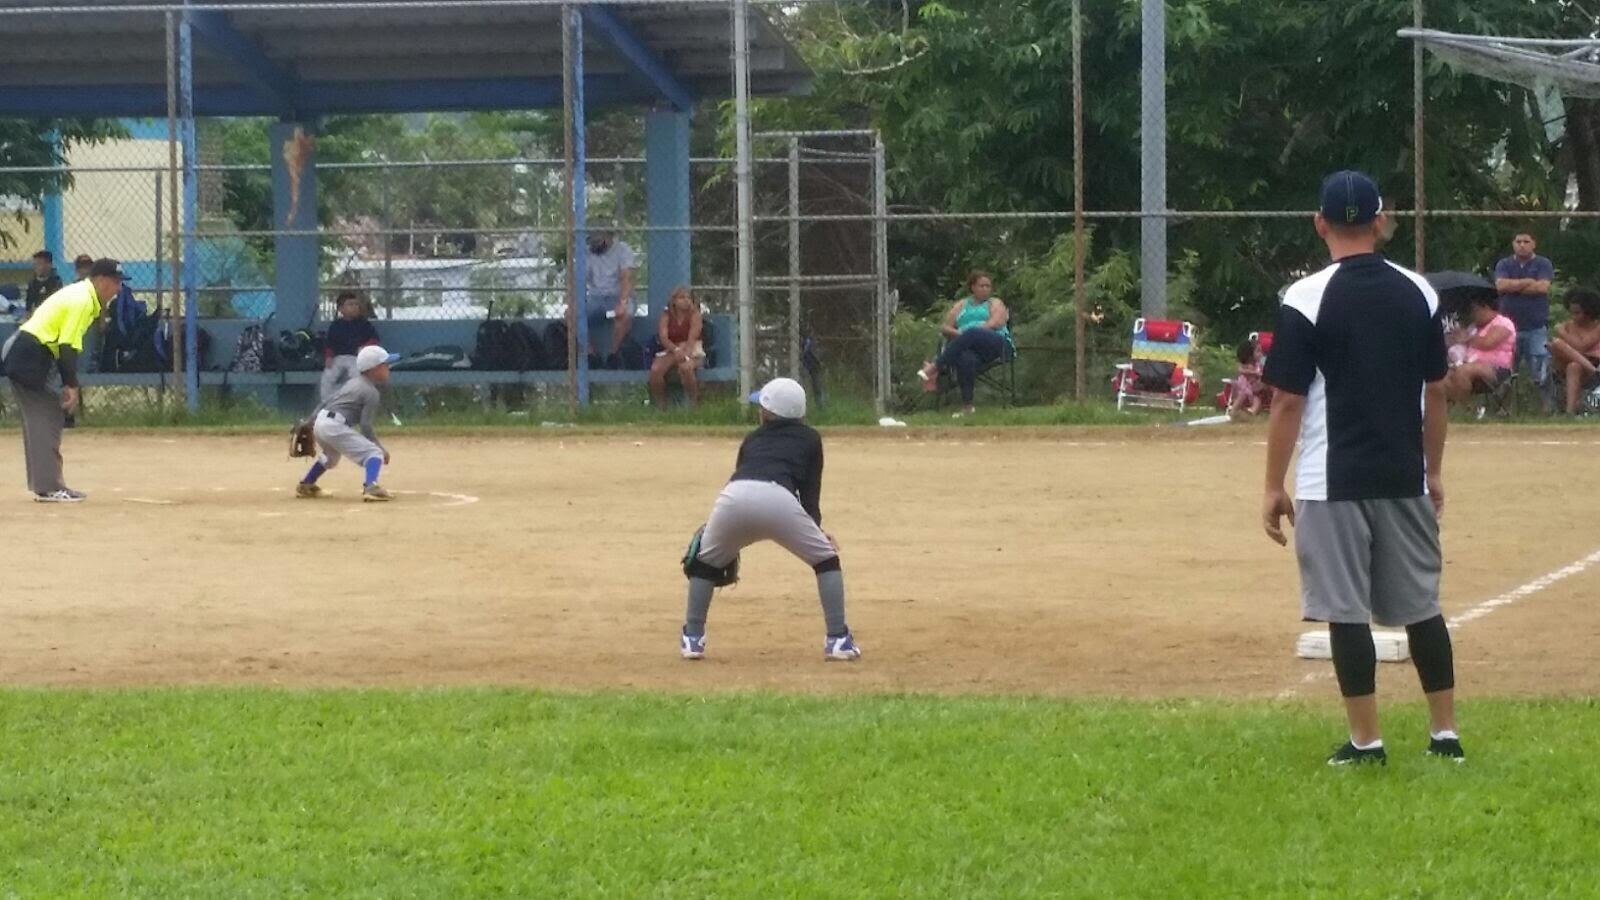 Beisbol3.jpg